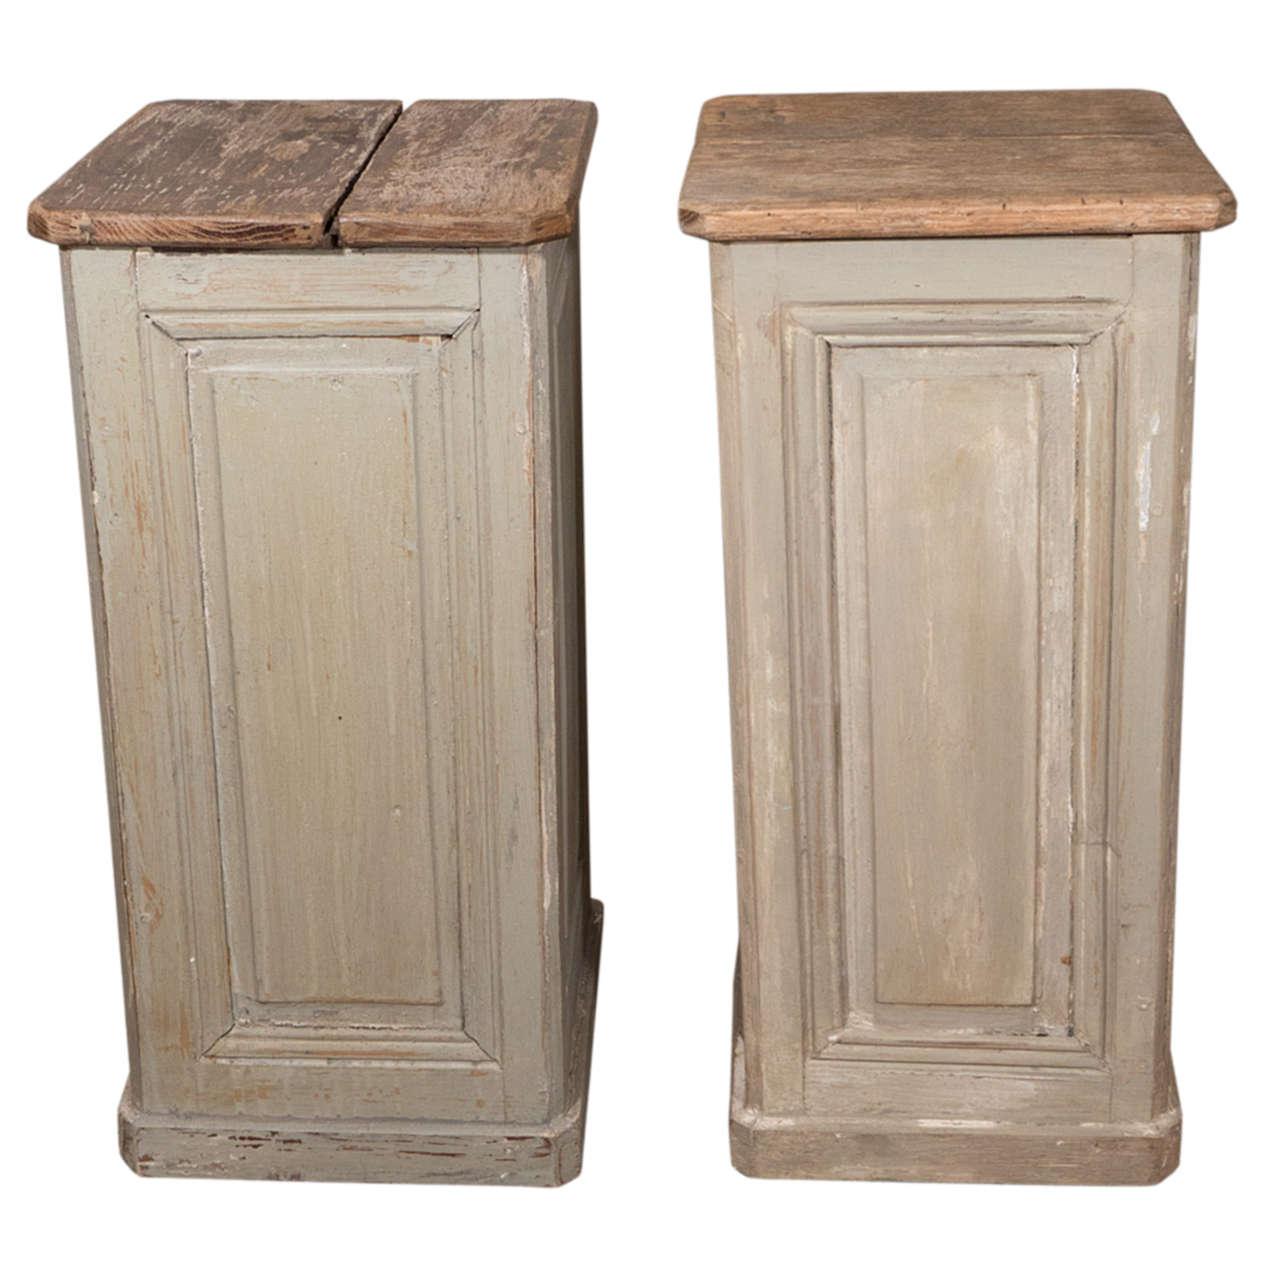 Pair Of Painted Wood Pedestals At 1stdibs